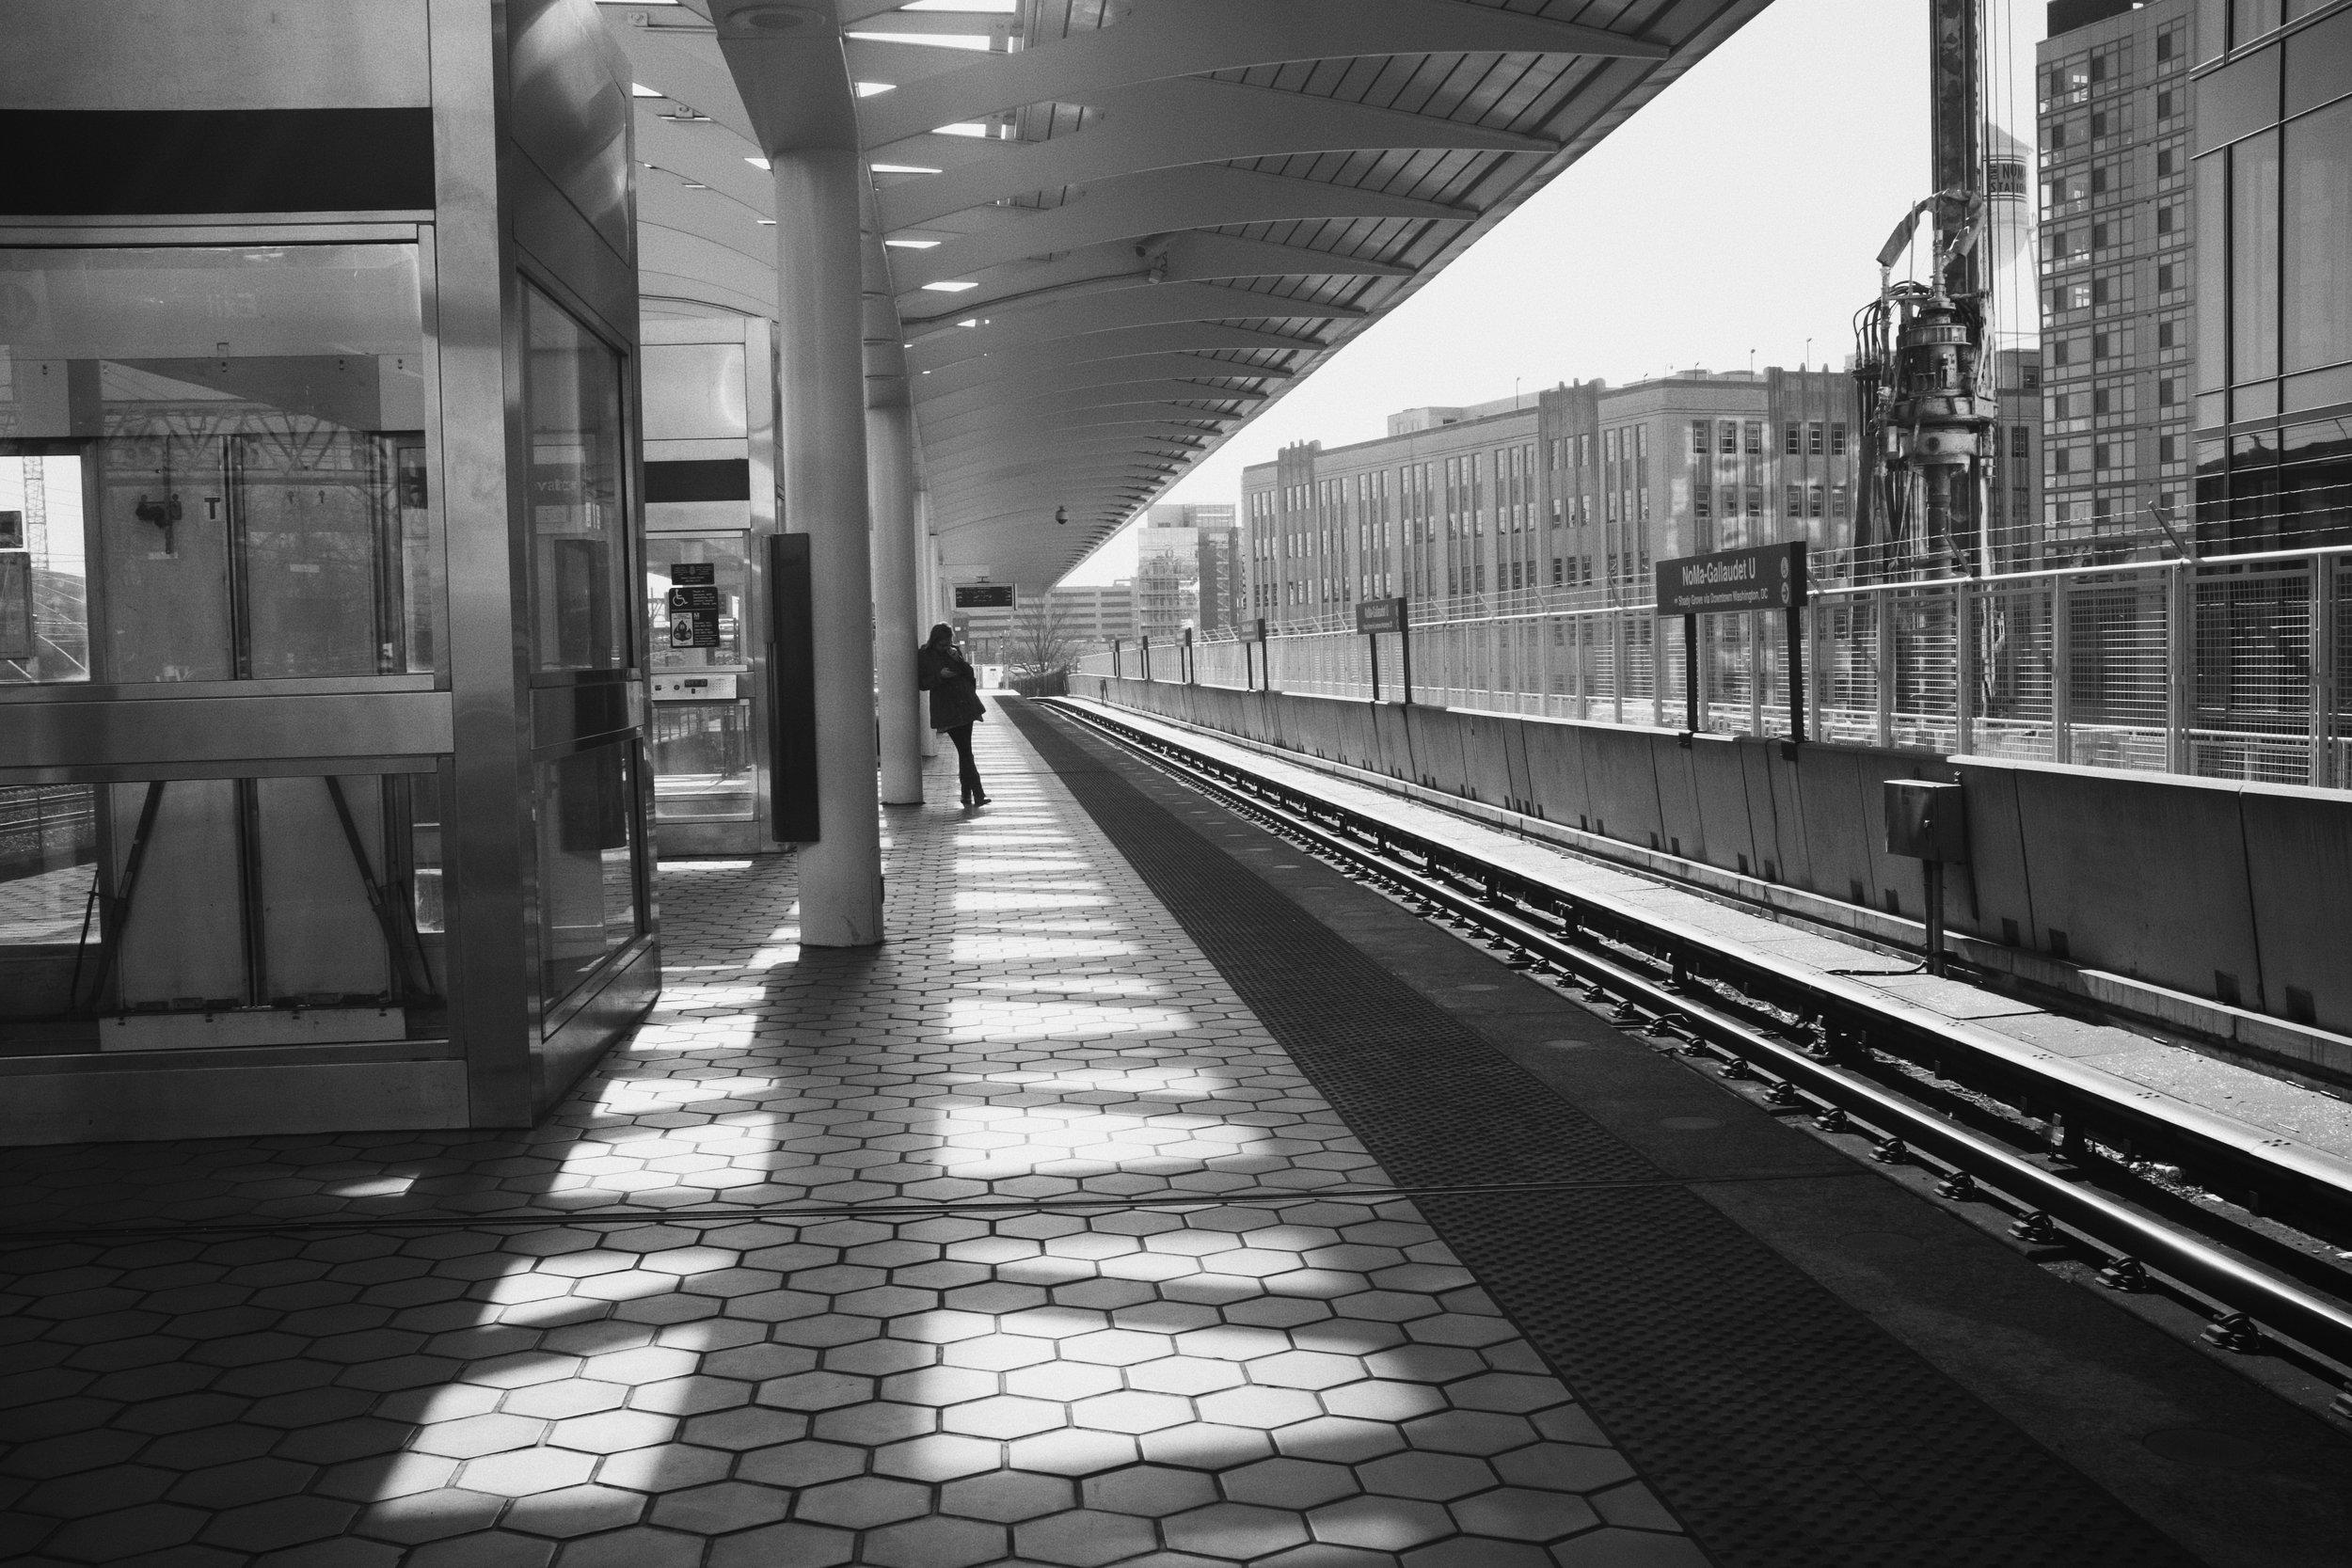 On the platform at the NoMa-Gallaudet station.